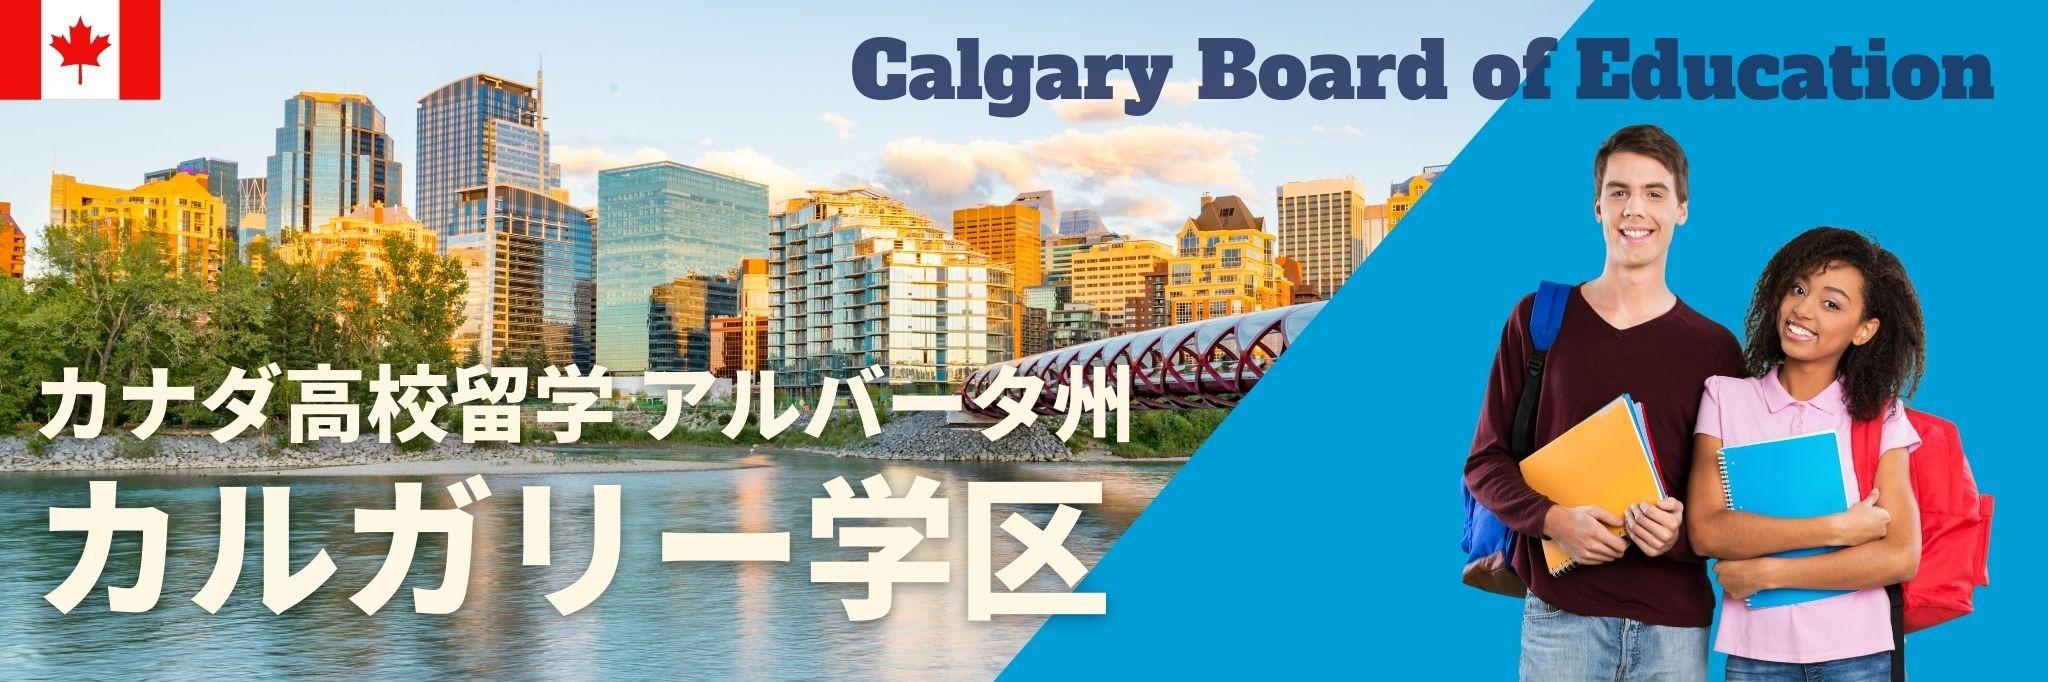 Calgary Board of Education(カルガリー学区)